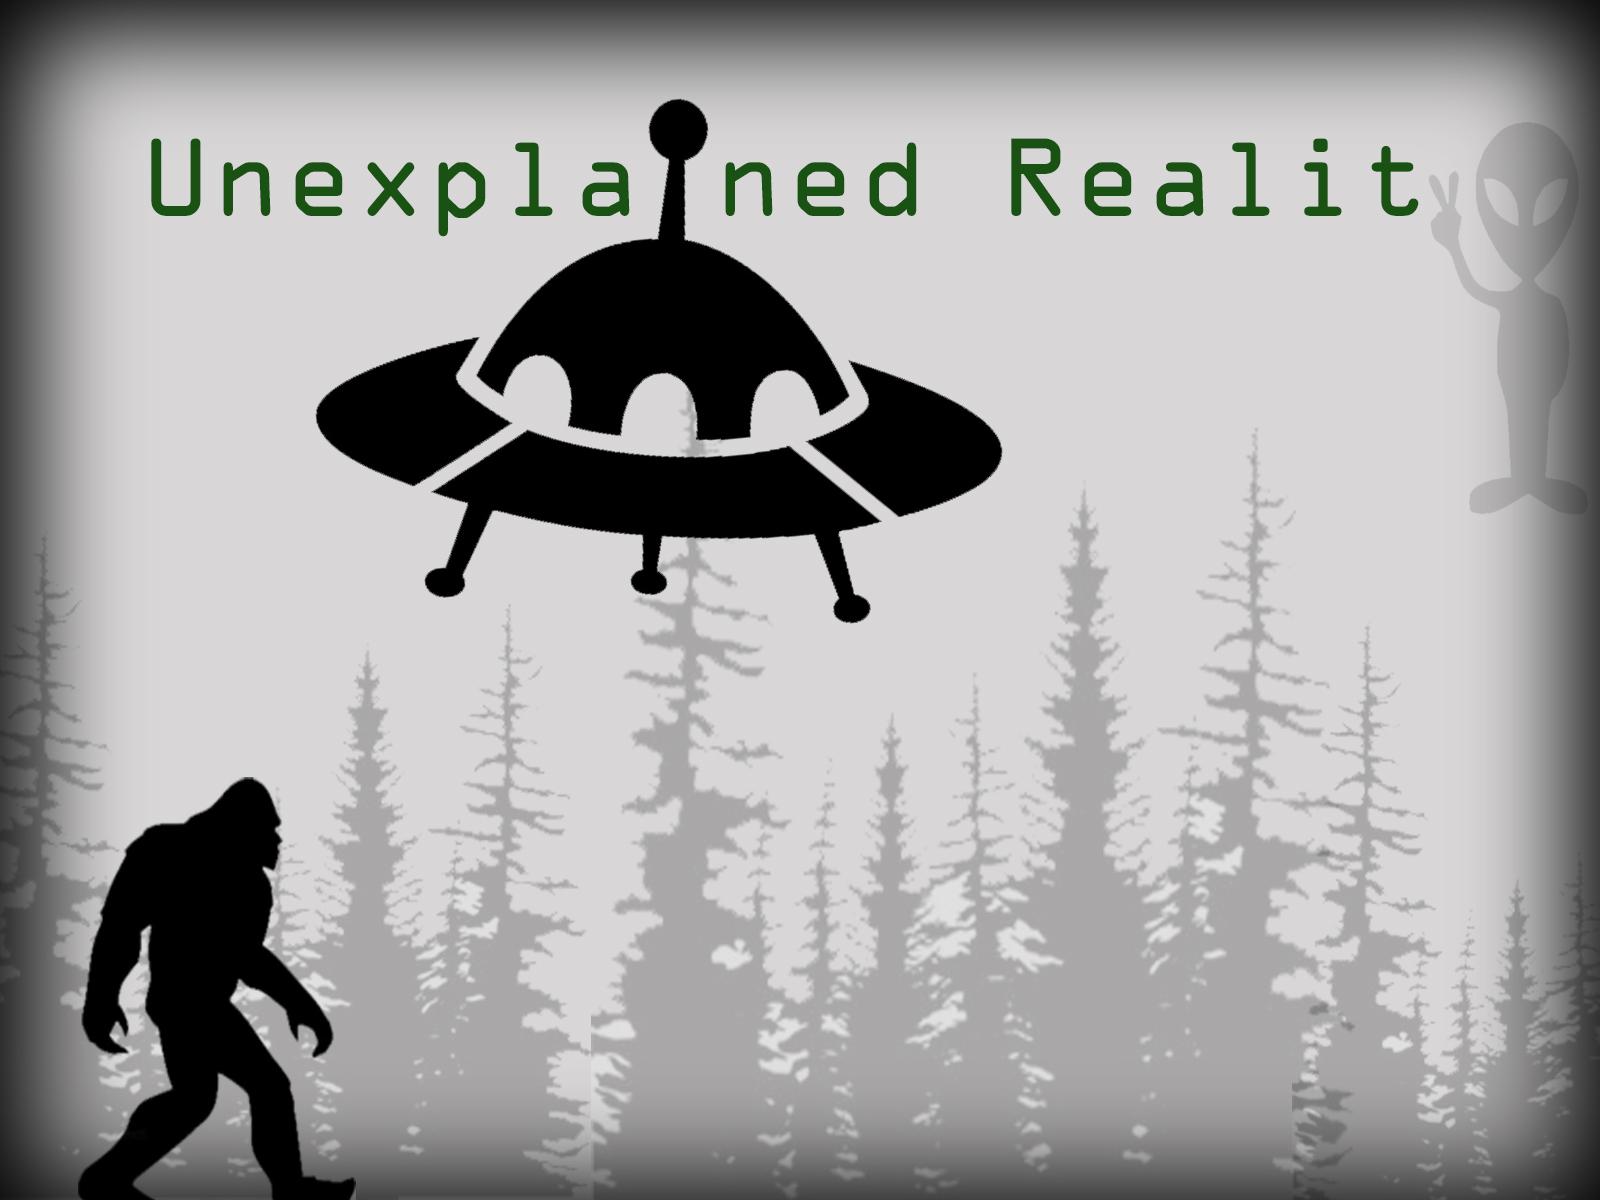 Unexplained Reality show art